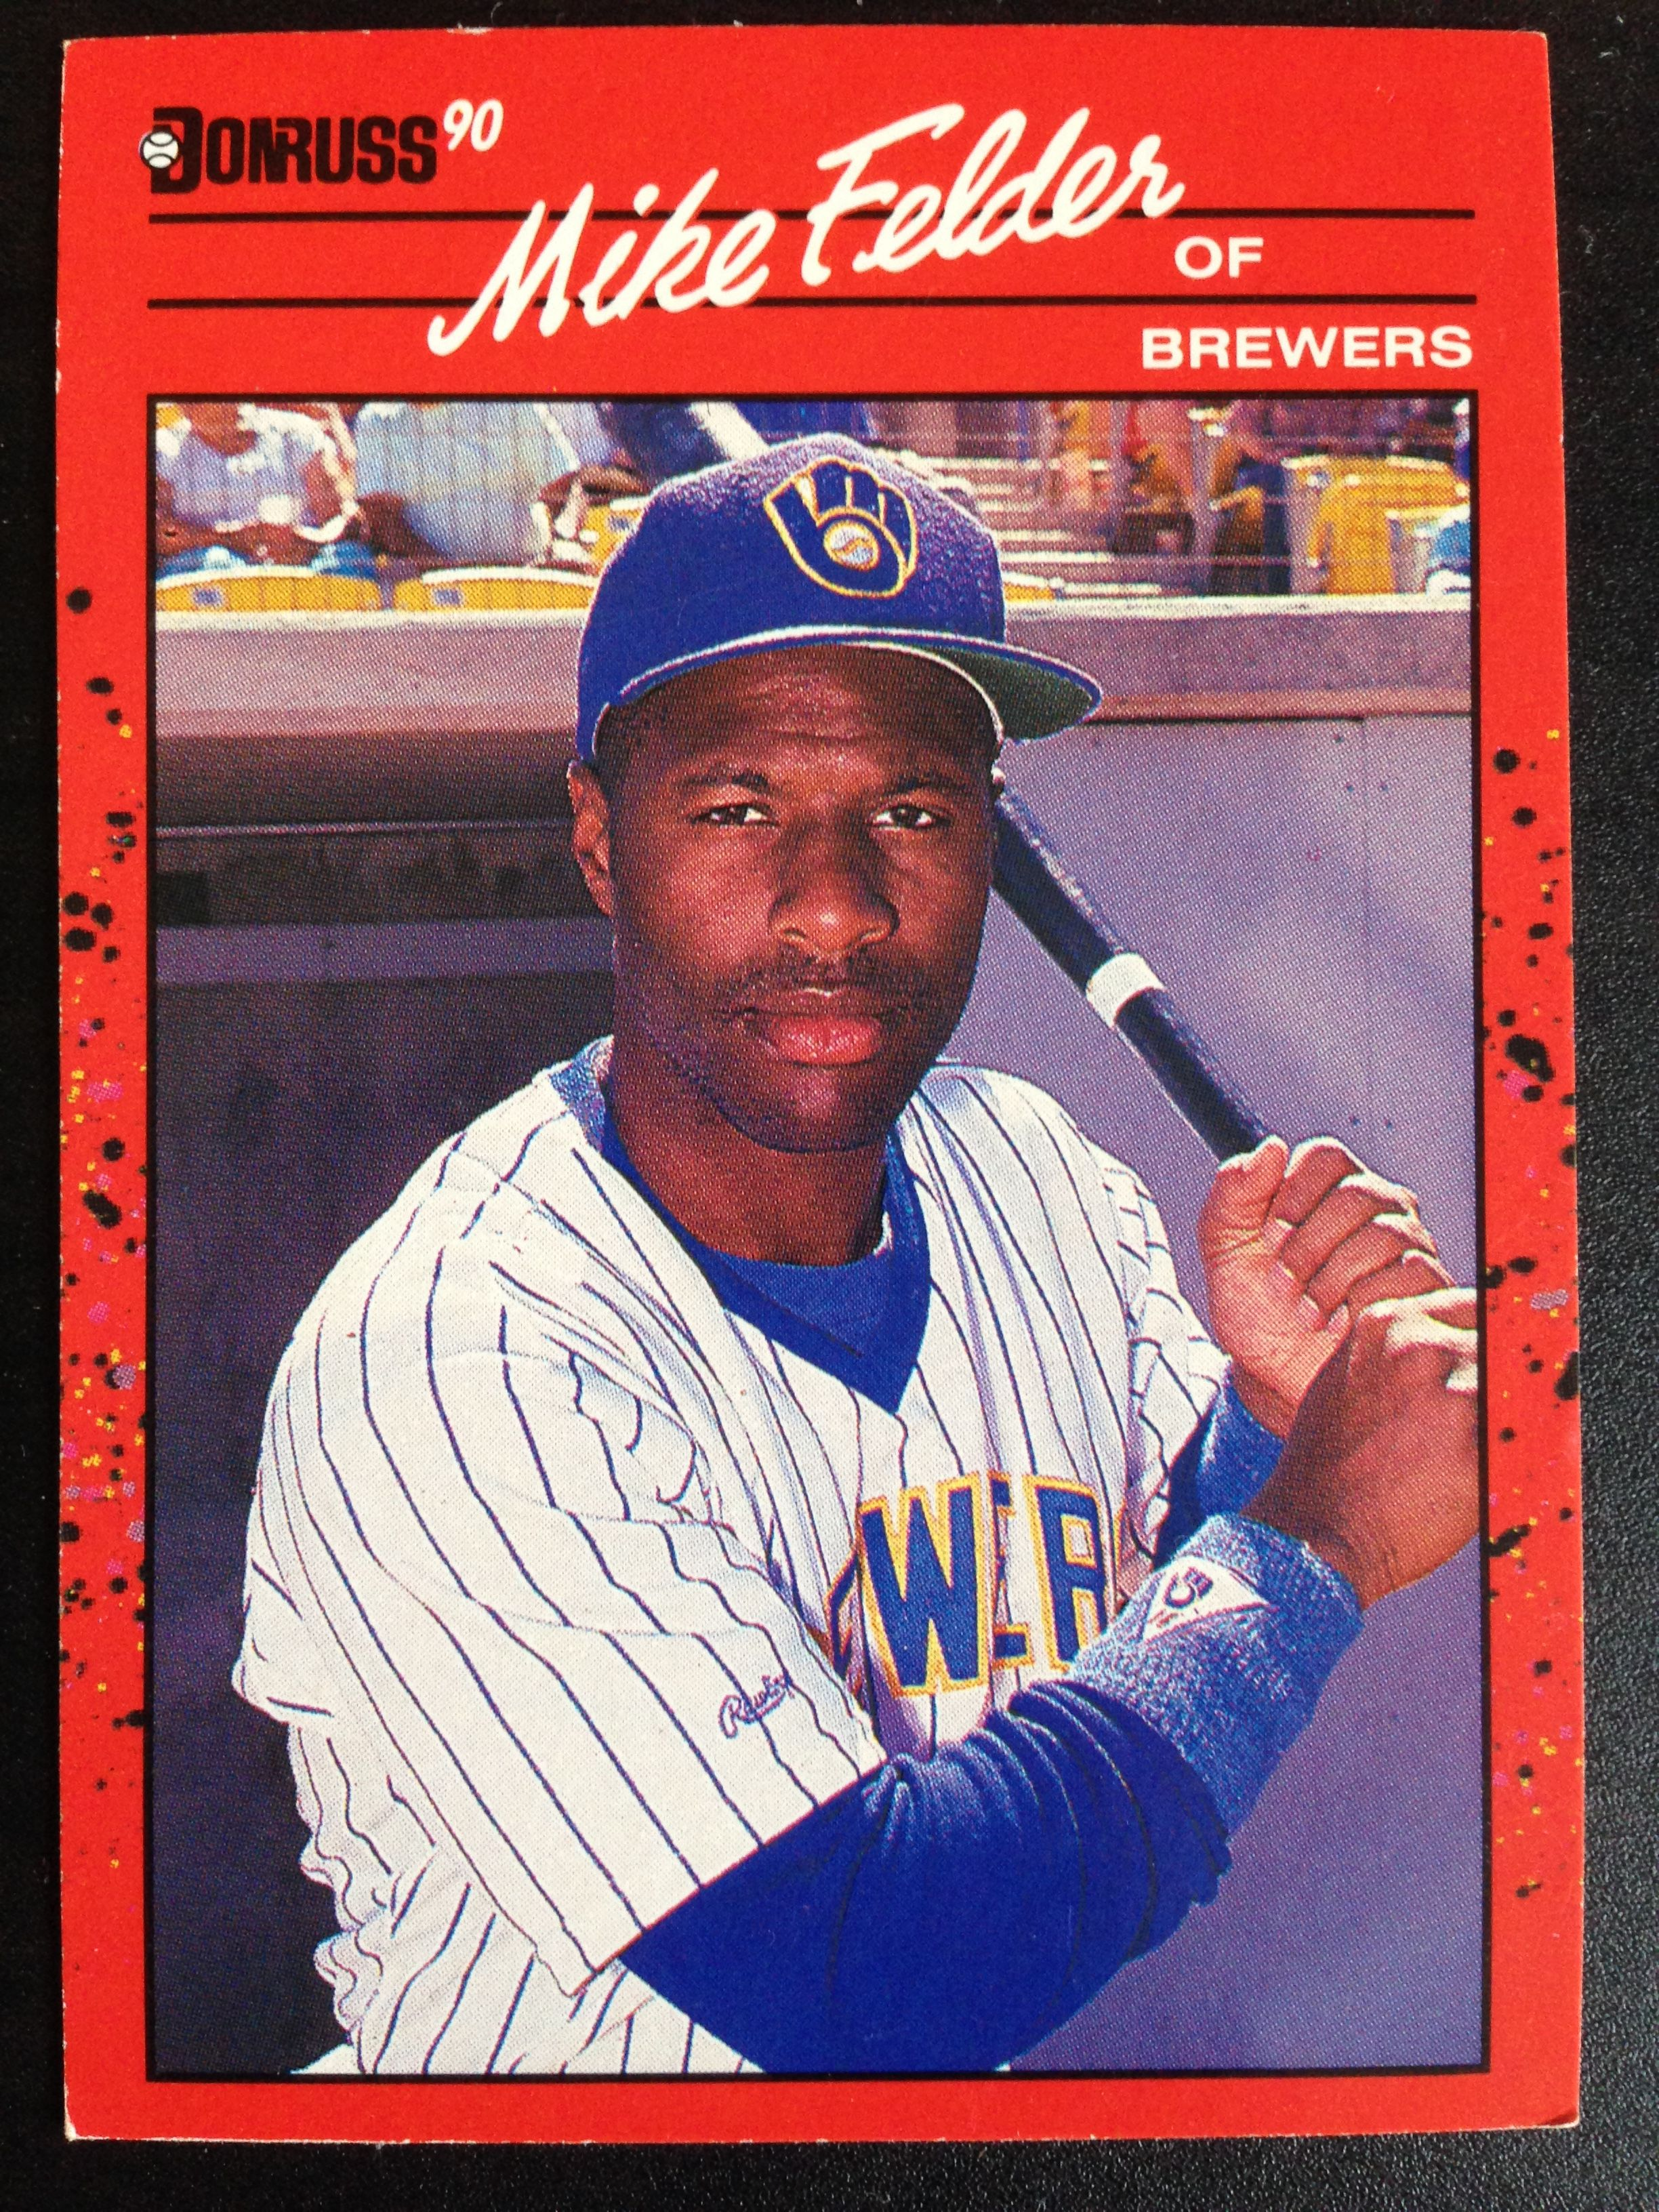 1894b09b4e 1989 Donruss Michael Otis Mike Felder #609 Baseball Card Collector Vintage